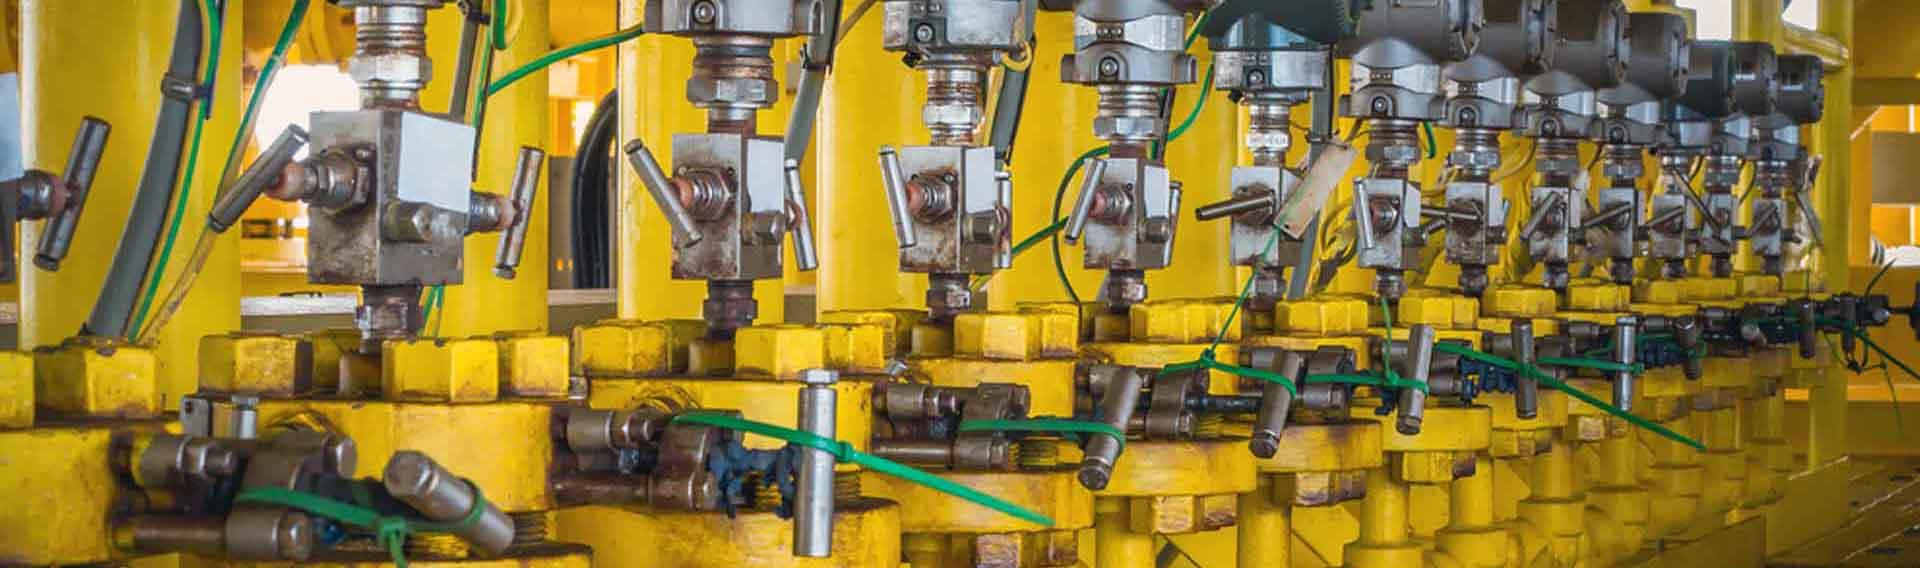 Waukesha Engine Parts   Request a Part Quote Online